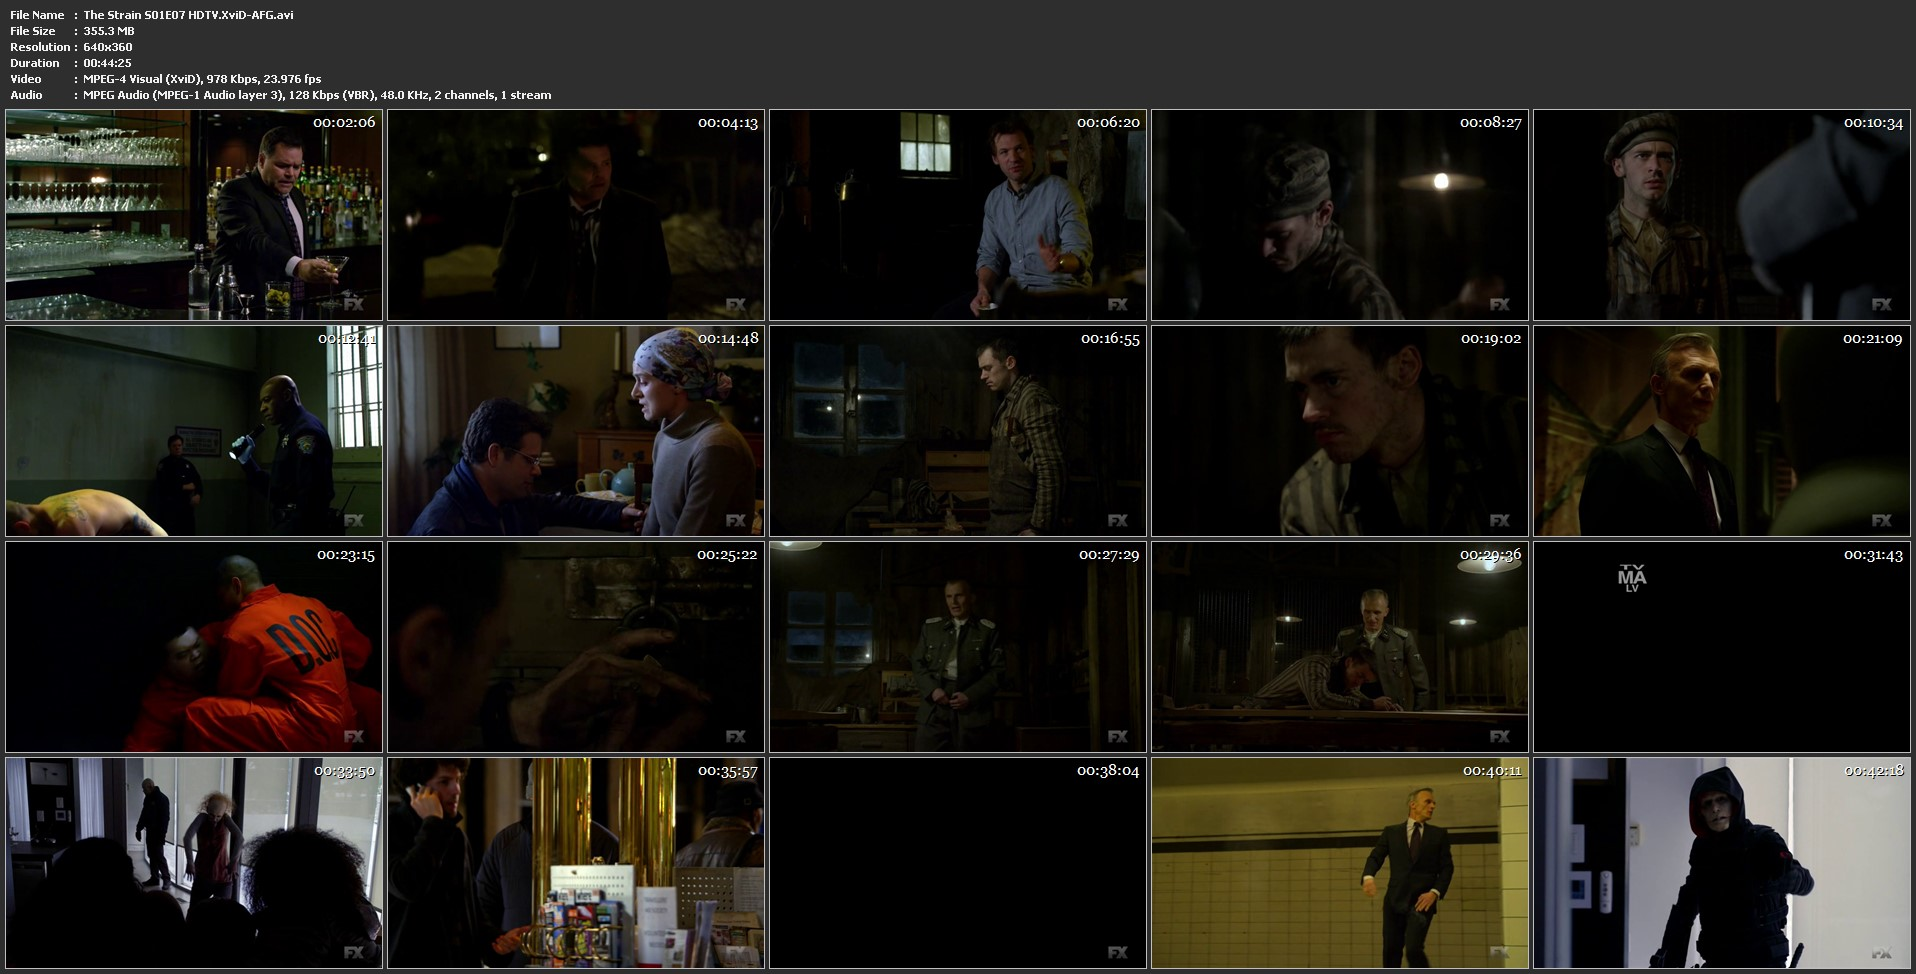 The_Strain_S01E07_HDTVXviD-AFGavi.jpg